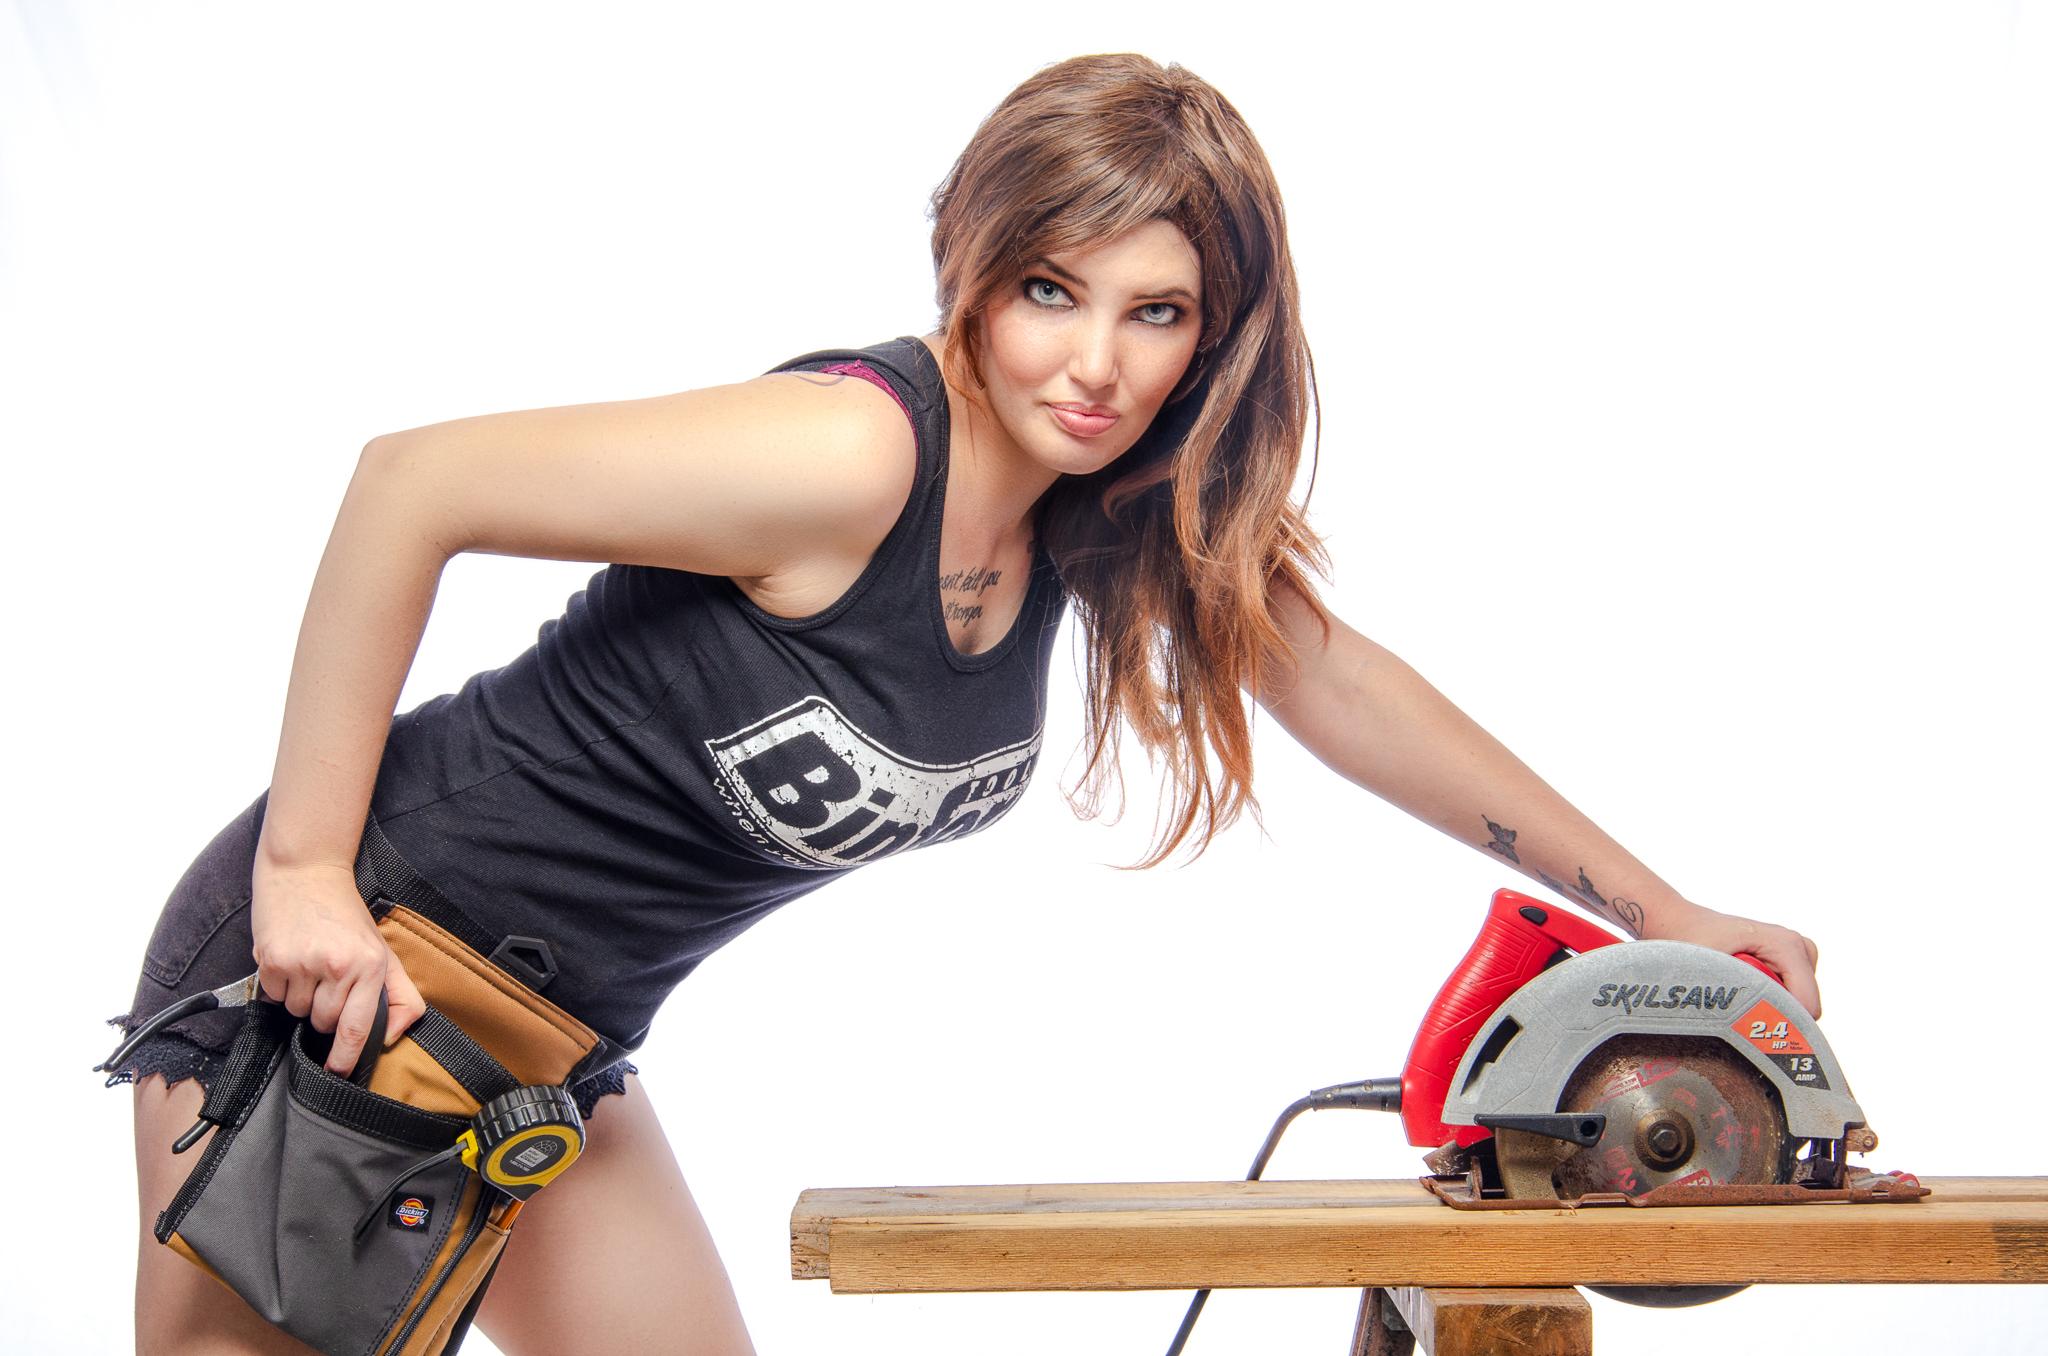 Haley tool time pinup-046-Edit.jpg